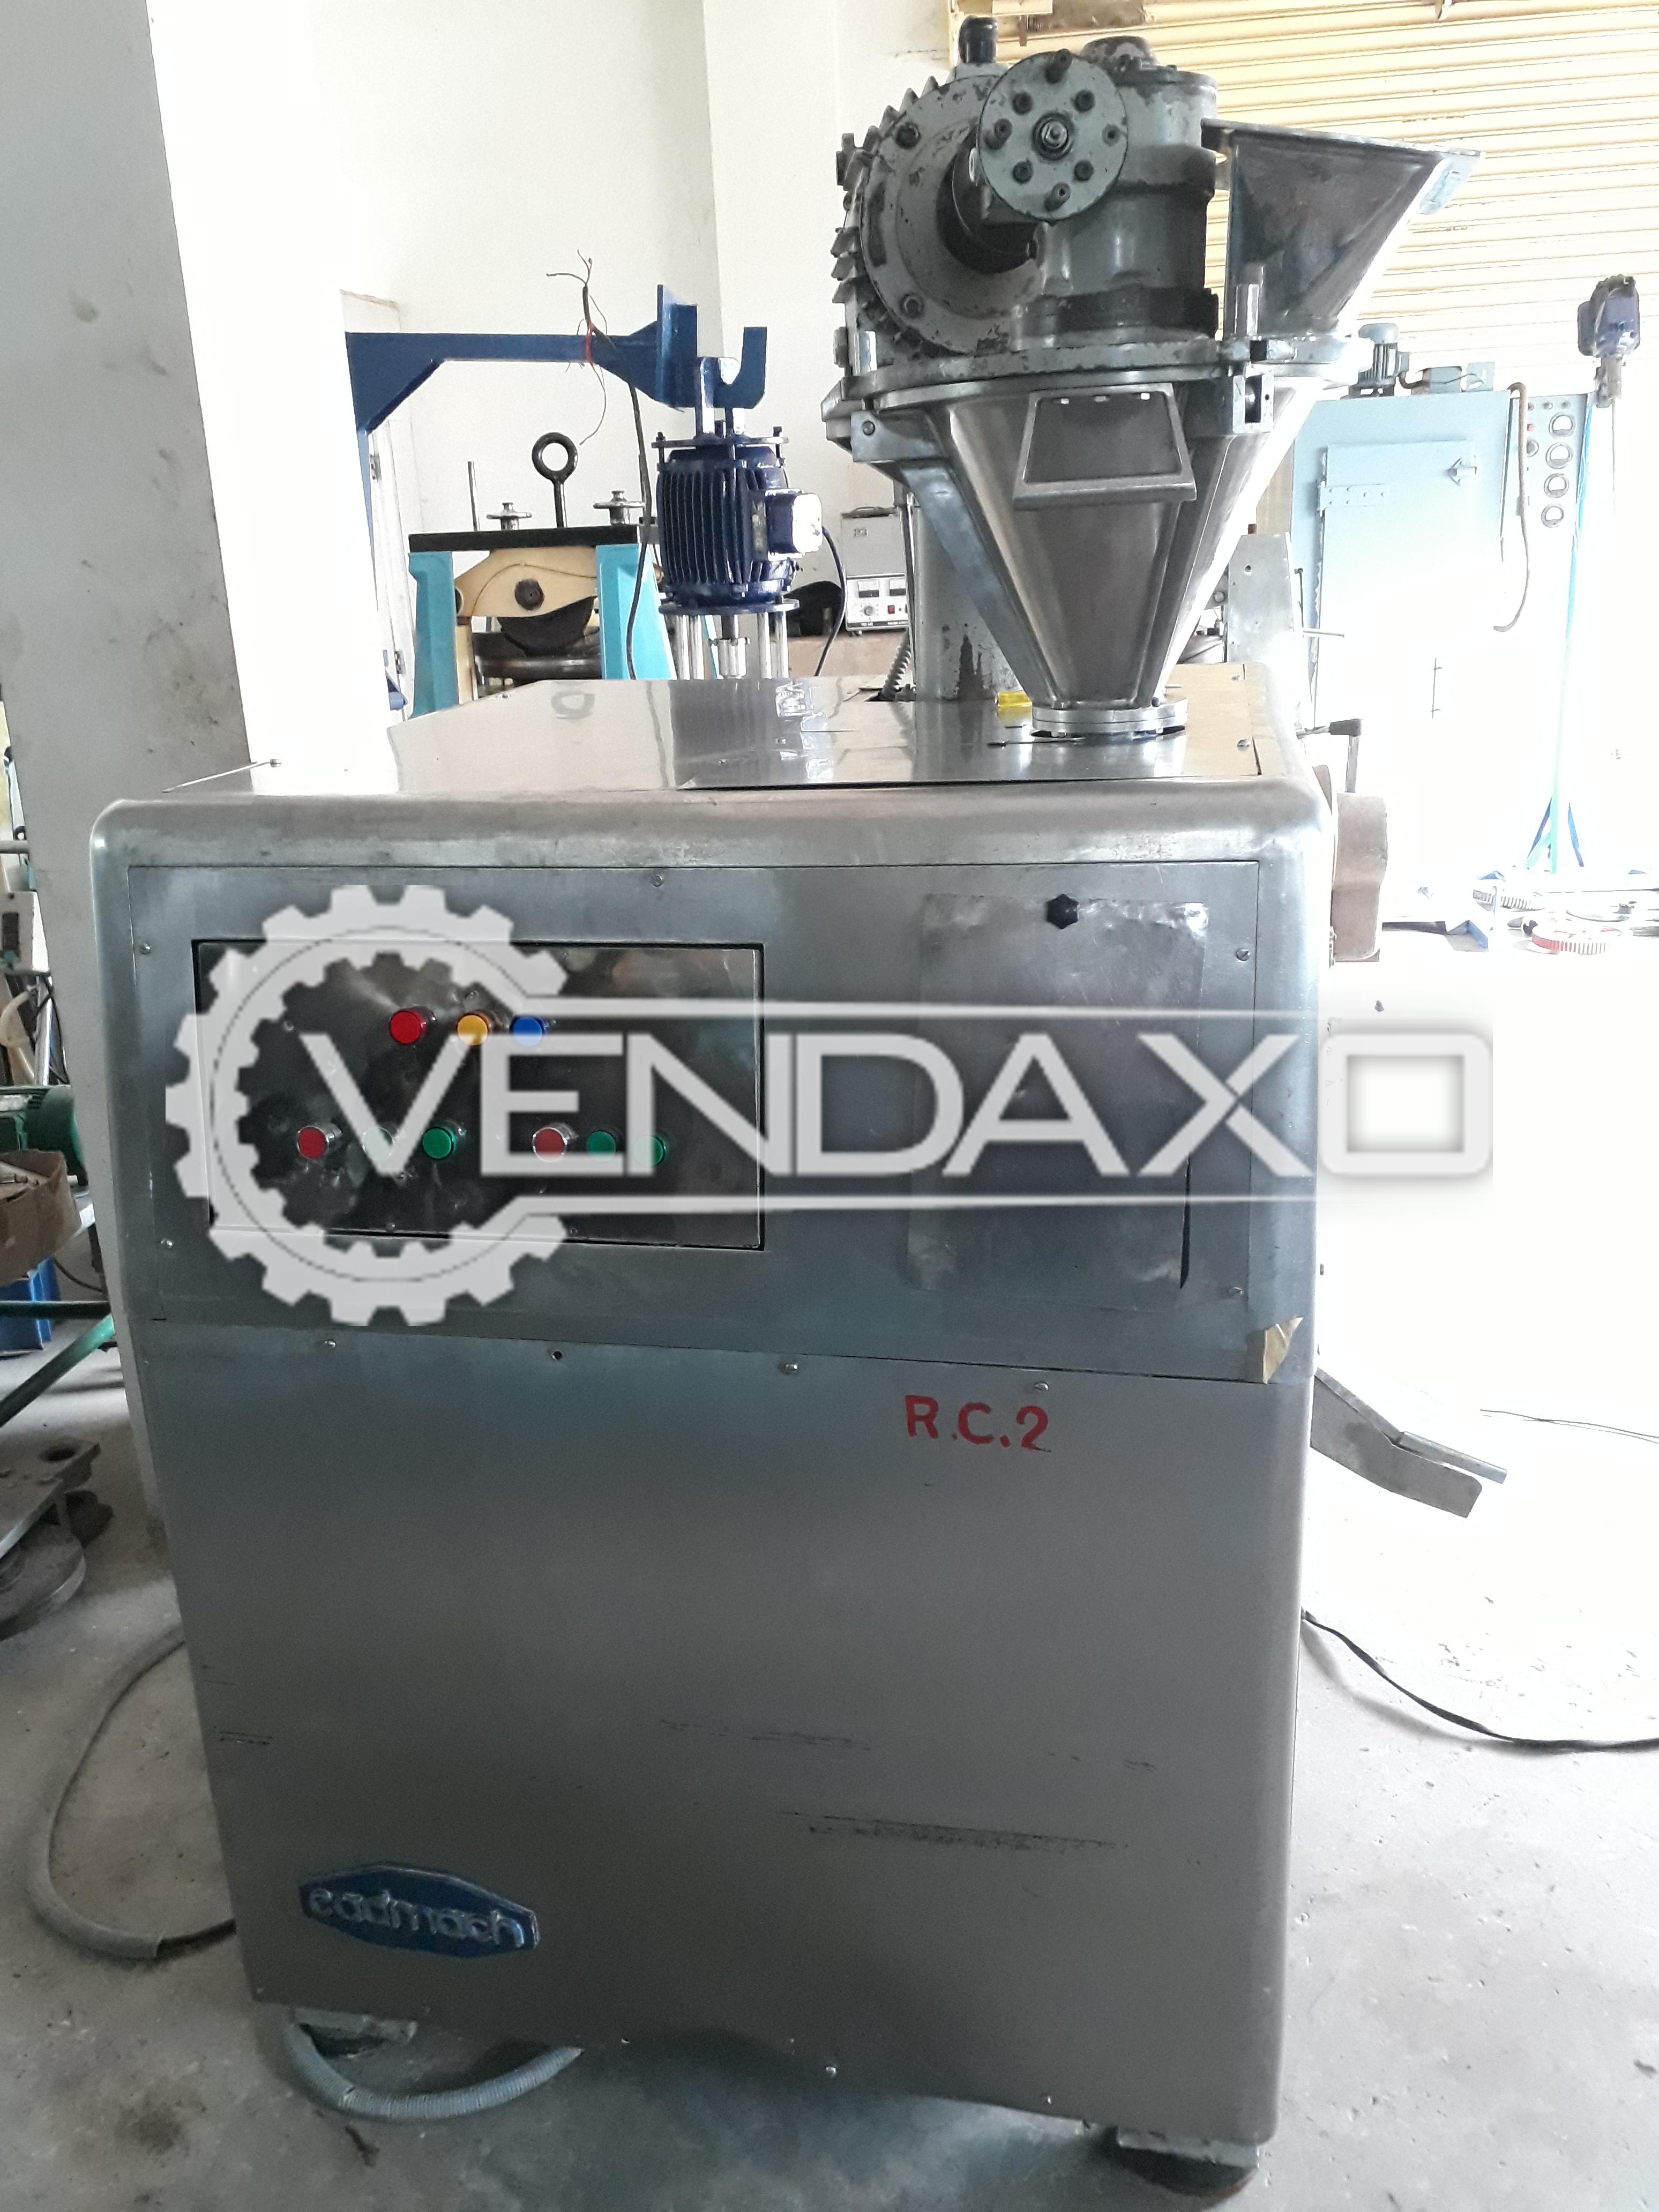 Cadmach GMP Roll Compactor - 30-100 KG/HR